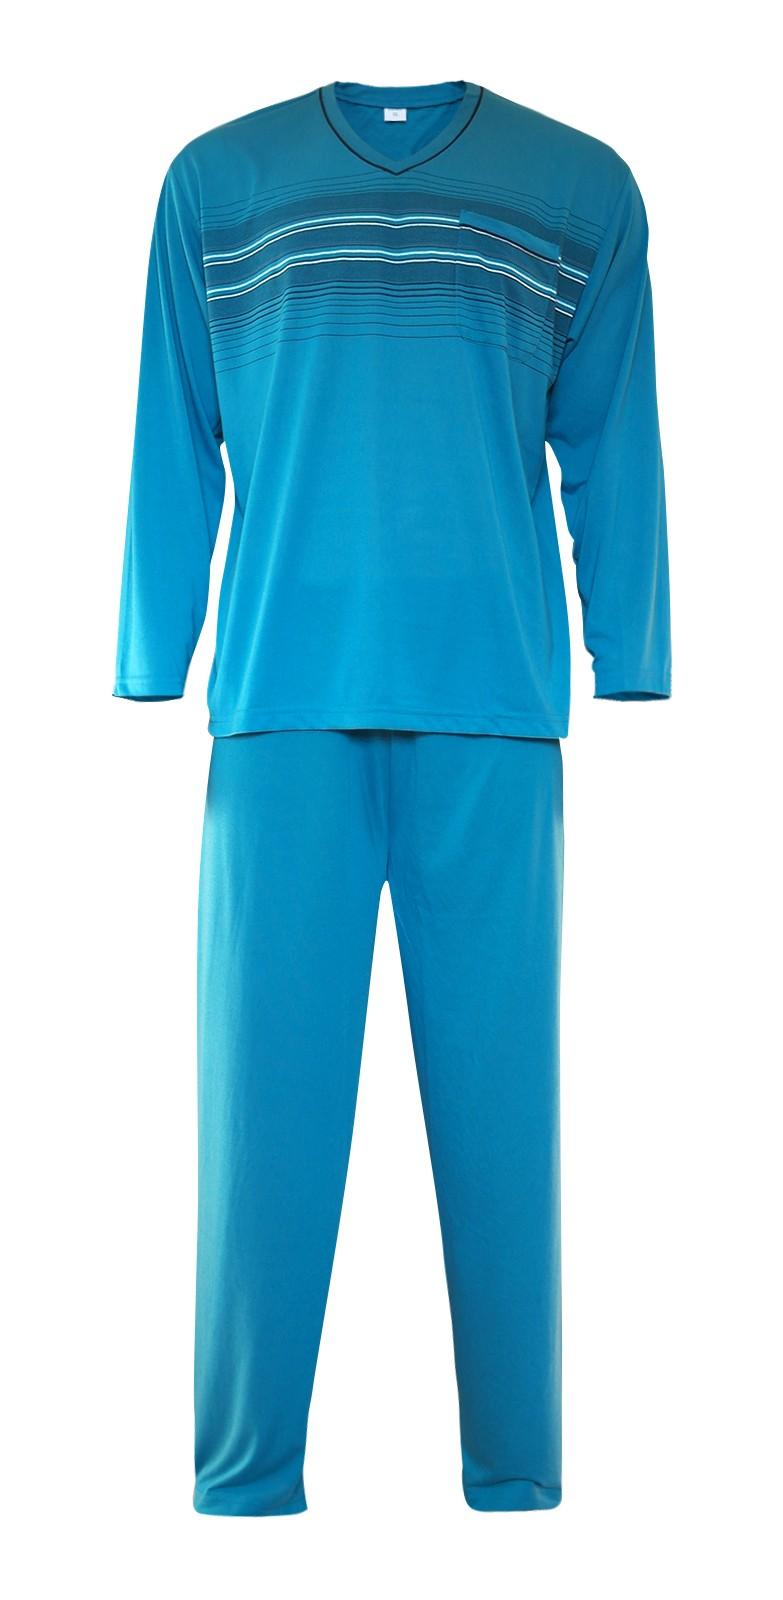 Herren Pyjama Schlafanzug lang 100% Baumwolle V-Neck the new Pajamas Trend M/3XL